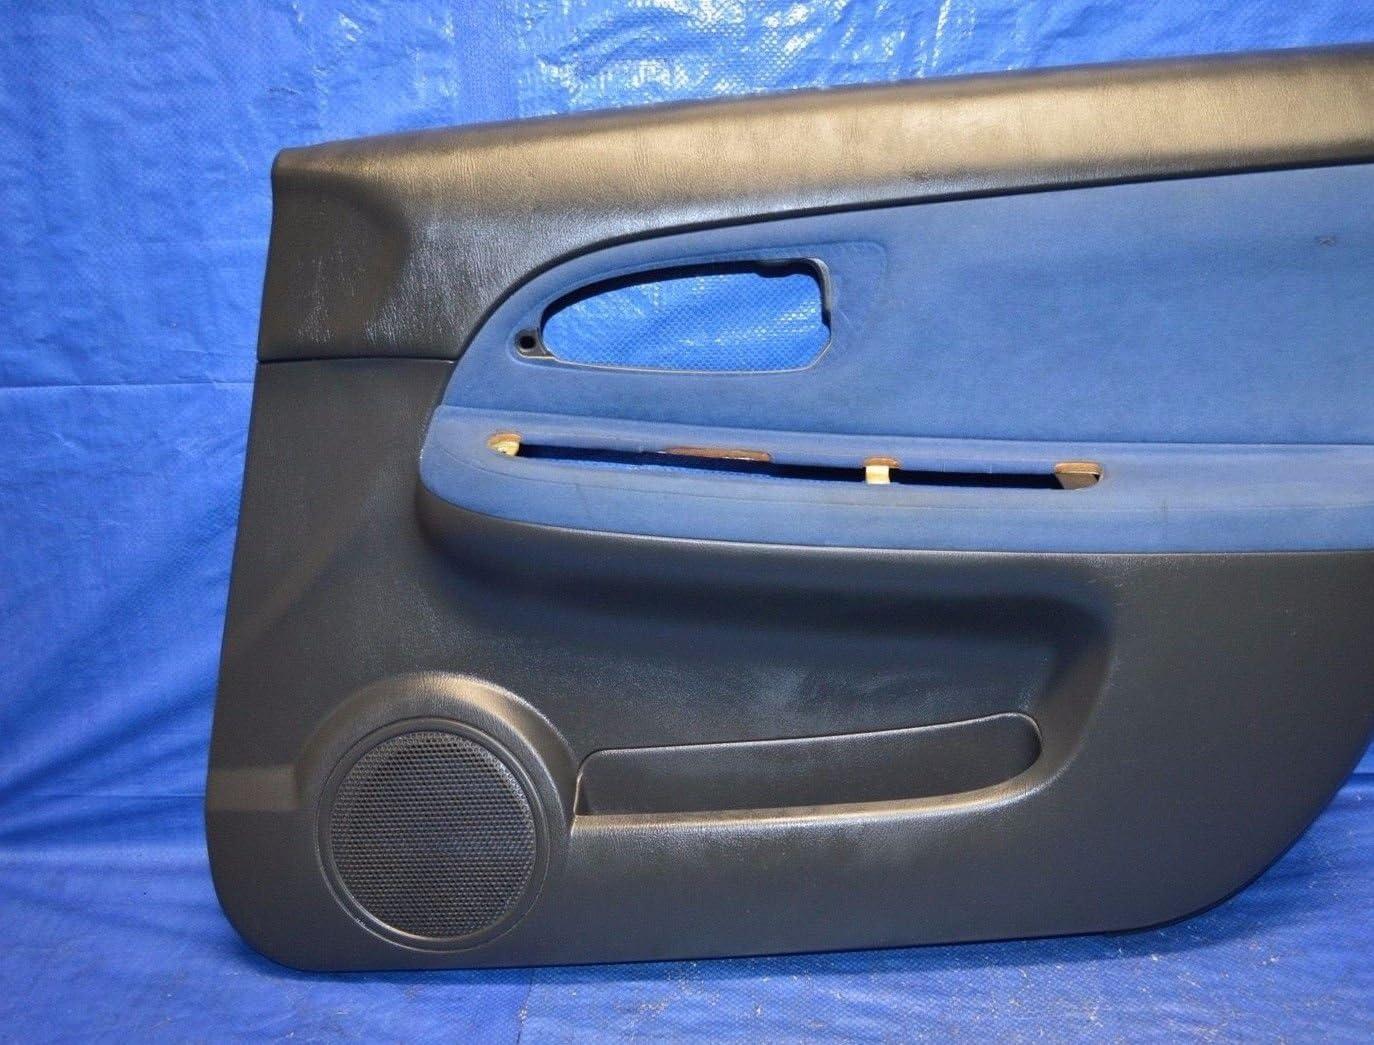 05-07 Subaru Impreza WRX & STI Passenger Rear Door Window Switch ...